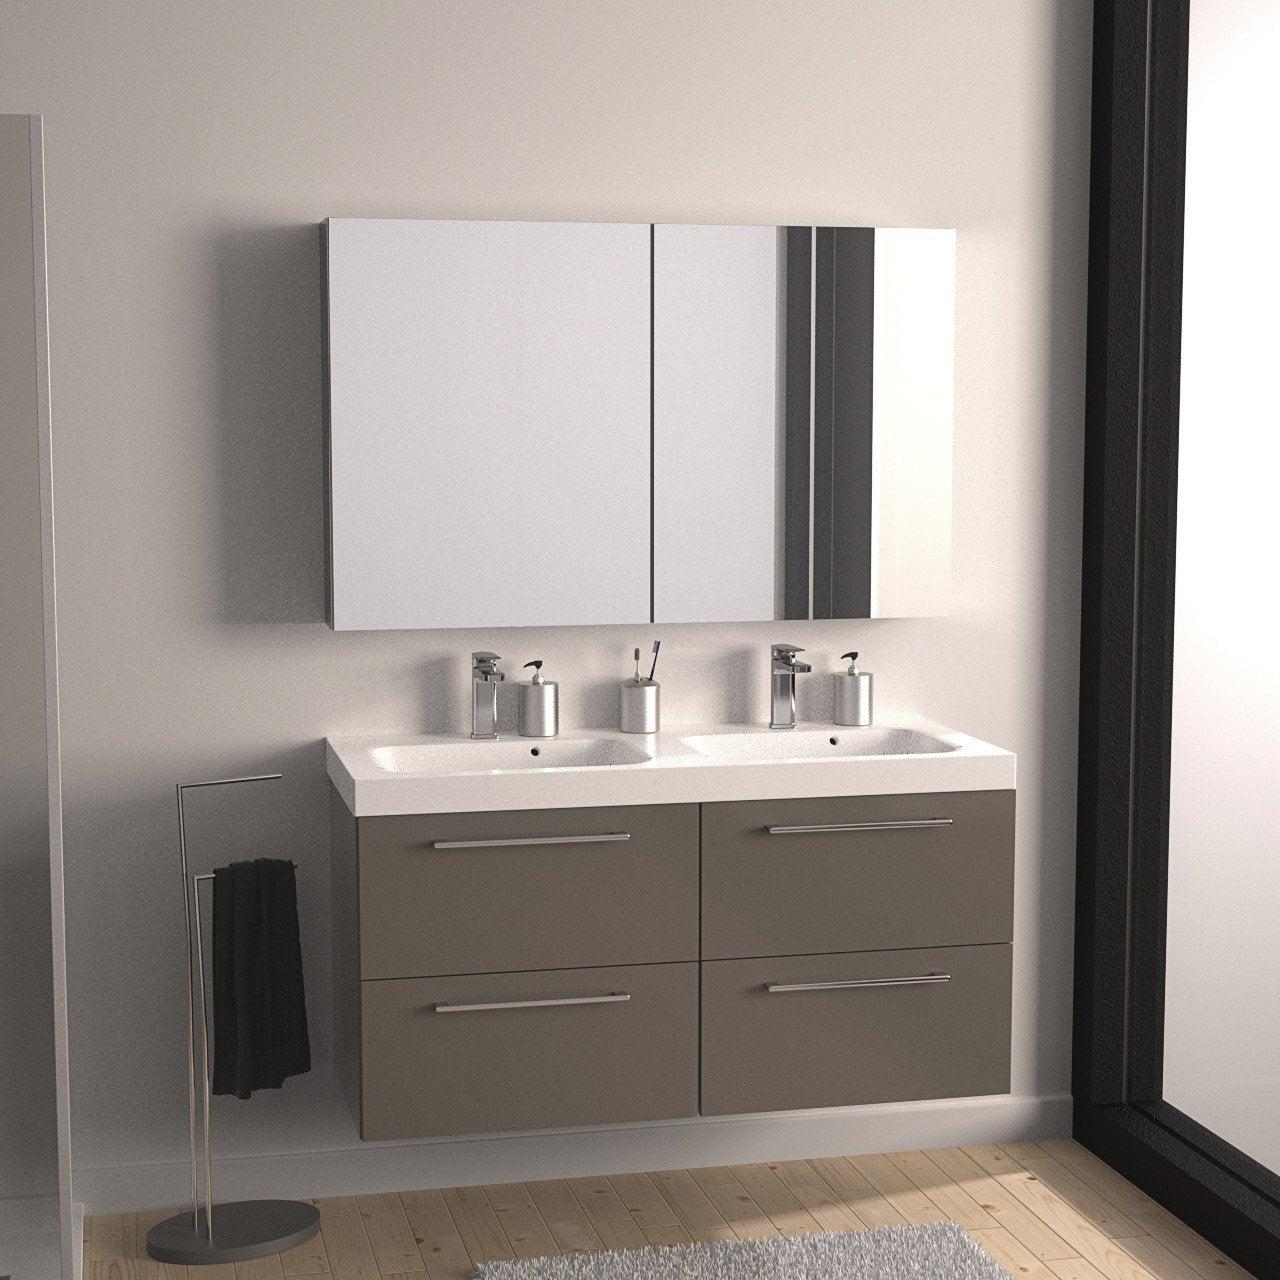 Meuble sous vasque x x cm brun sensea - Leroy merlin meuble sous vasque ...